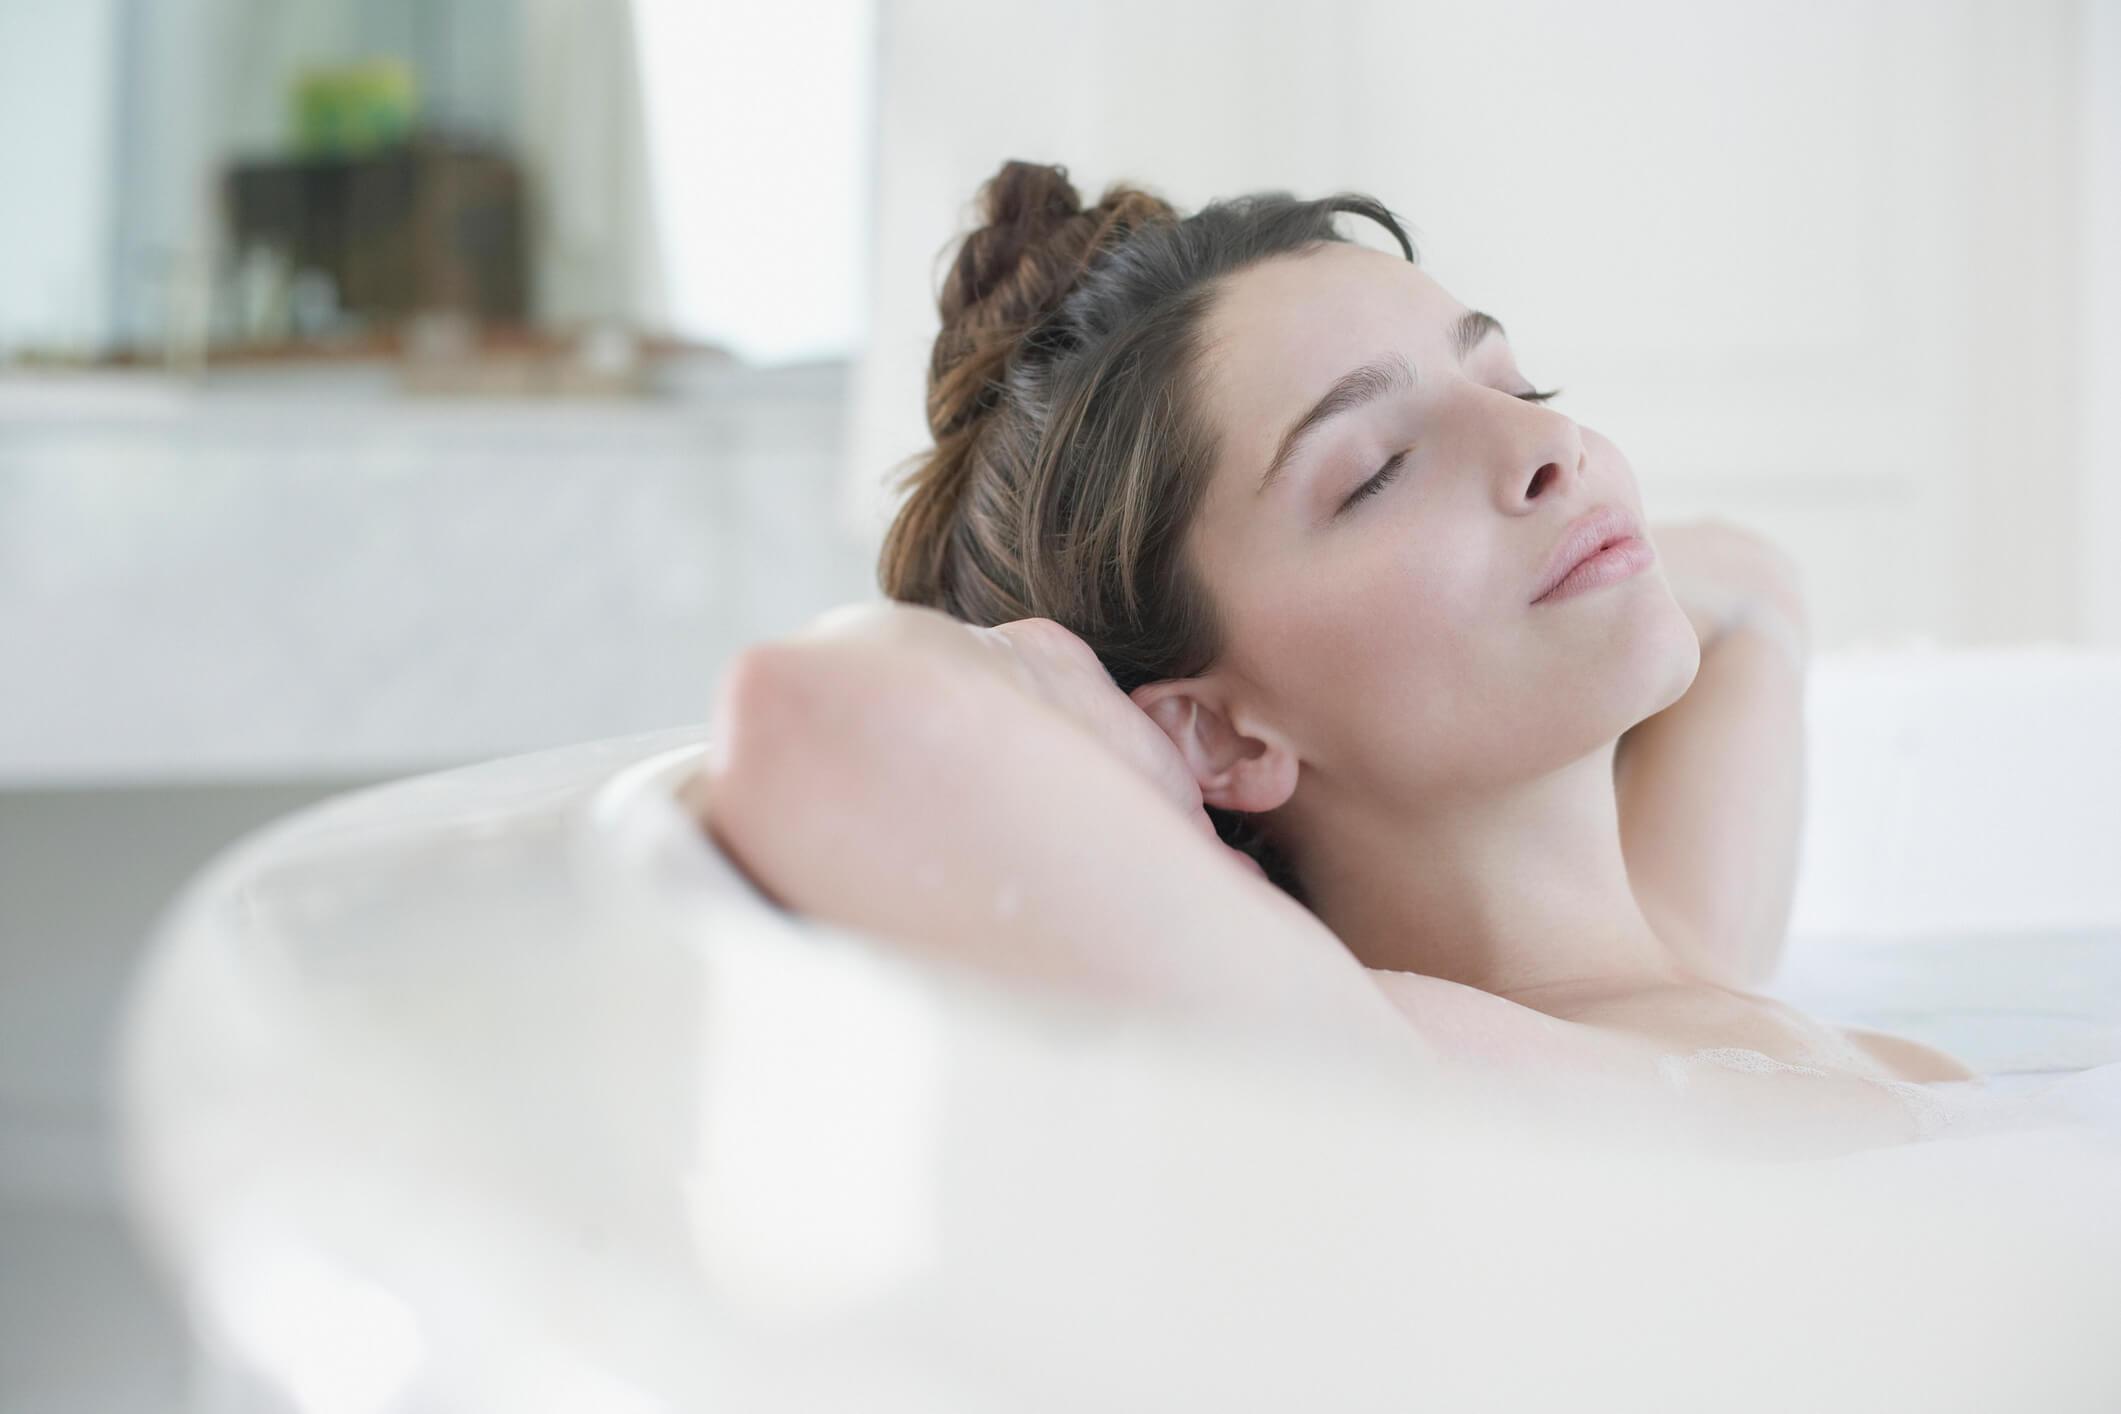 A woman relaxing in a bathtub